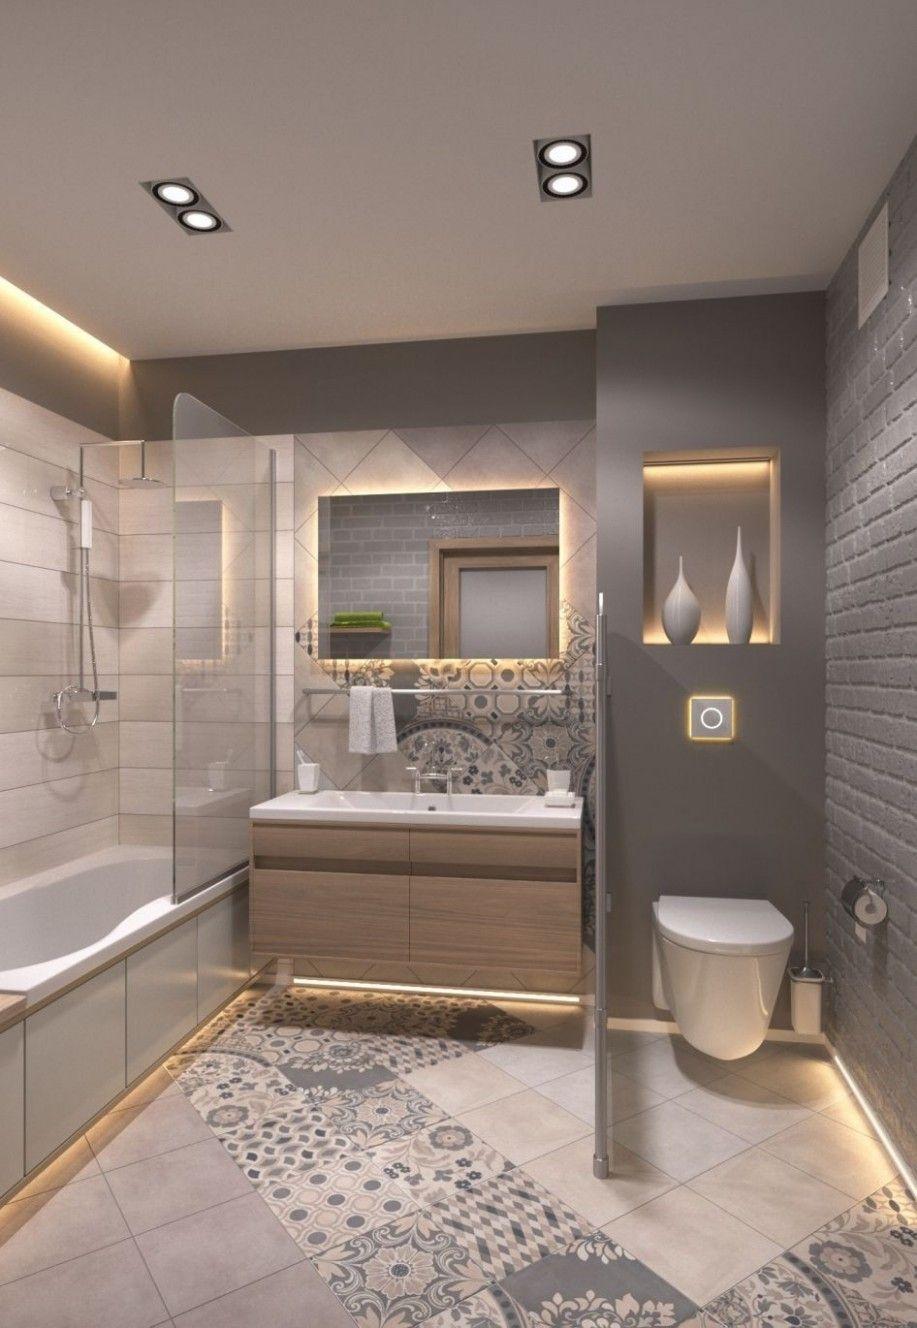 Bathroom Shower Renovation Ideas Bathroom Layout Bathrooms Remodel Bathroom Remodel Master Bathroom design ideas uk